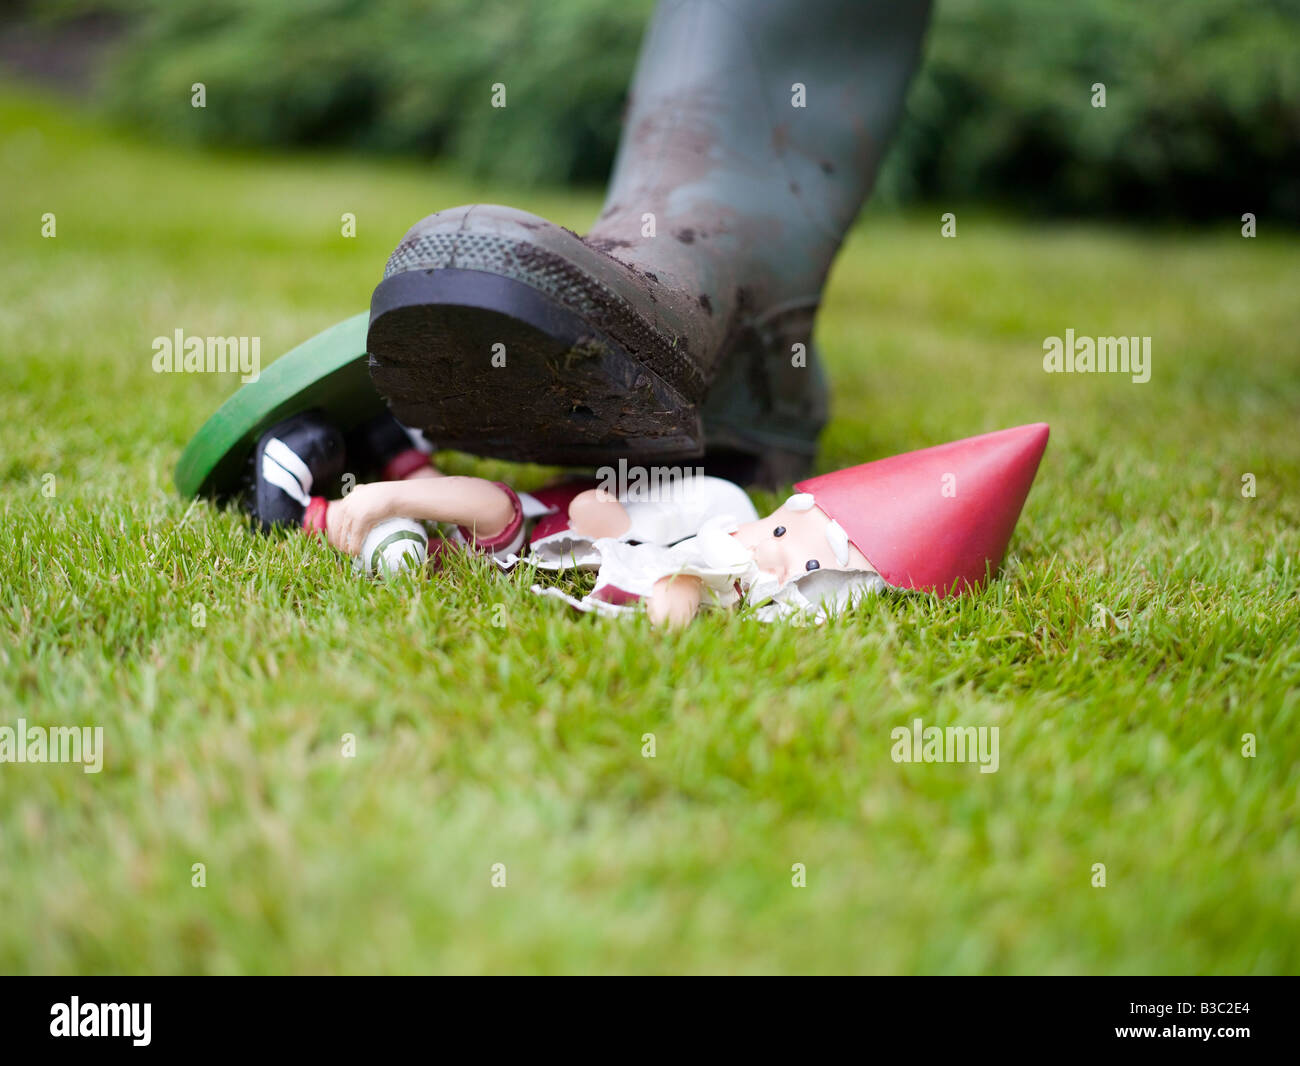 foot trampling   garden gnome stock photo